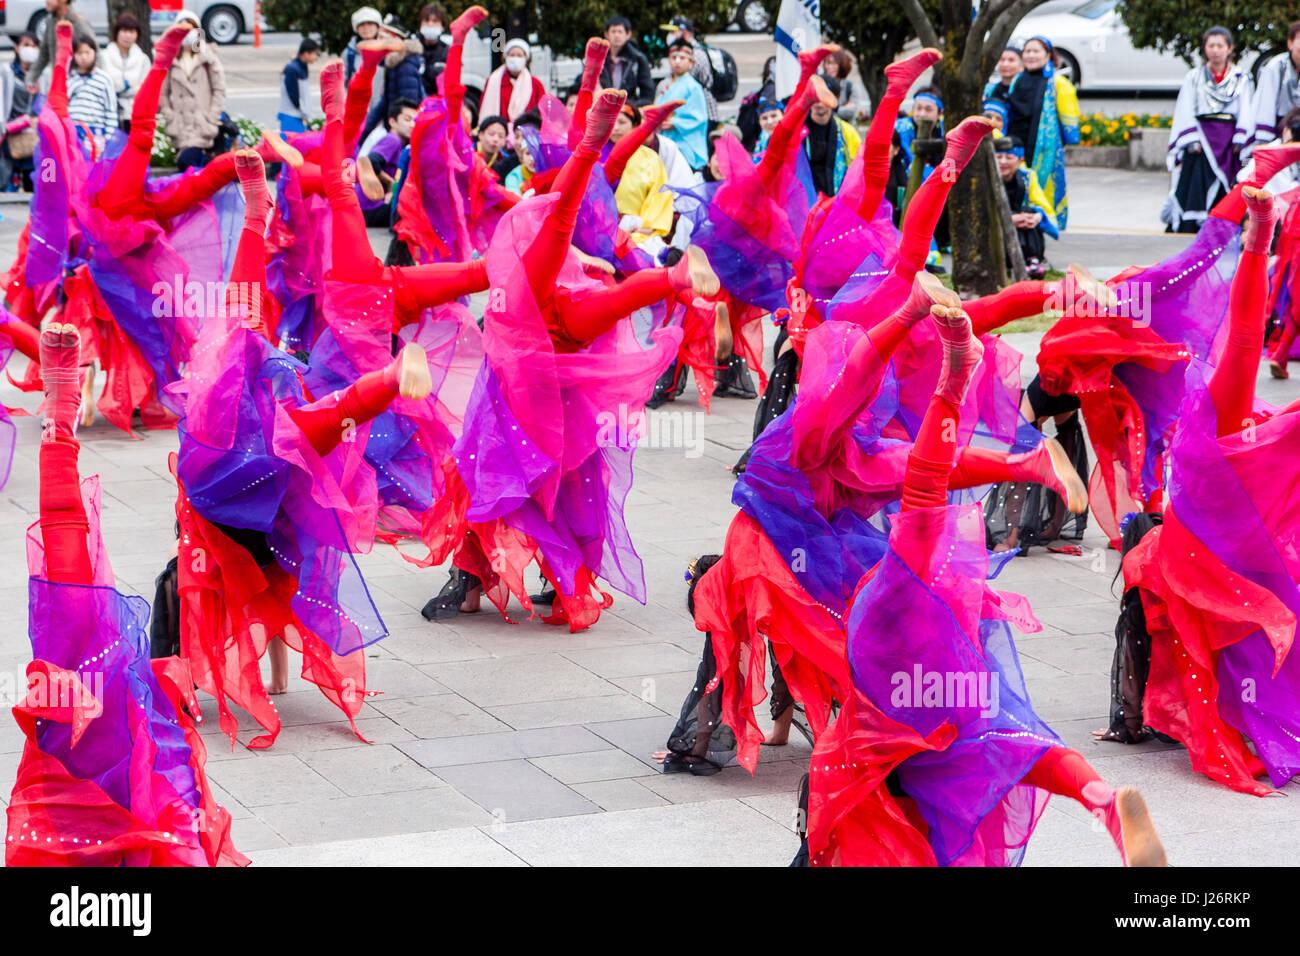 Hinokuni Yosakoi dance Festival. Children's Girl dance team, all dressed as fairies in red flayed costumes, somersaulting Stock Photo